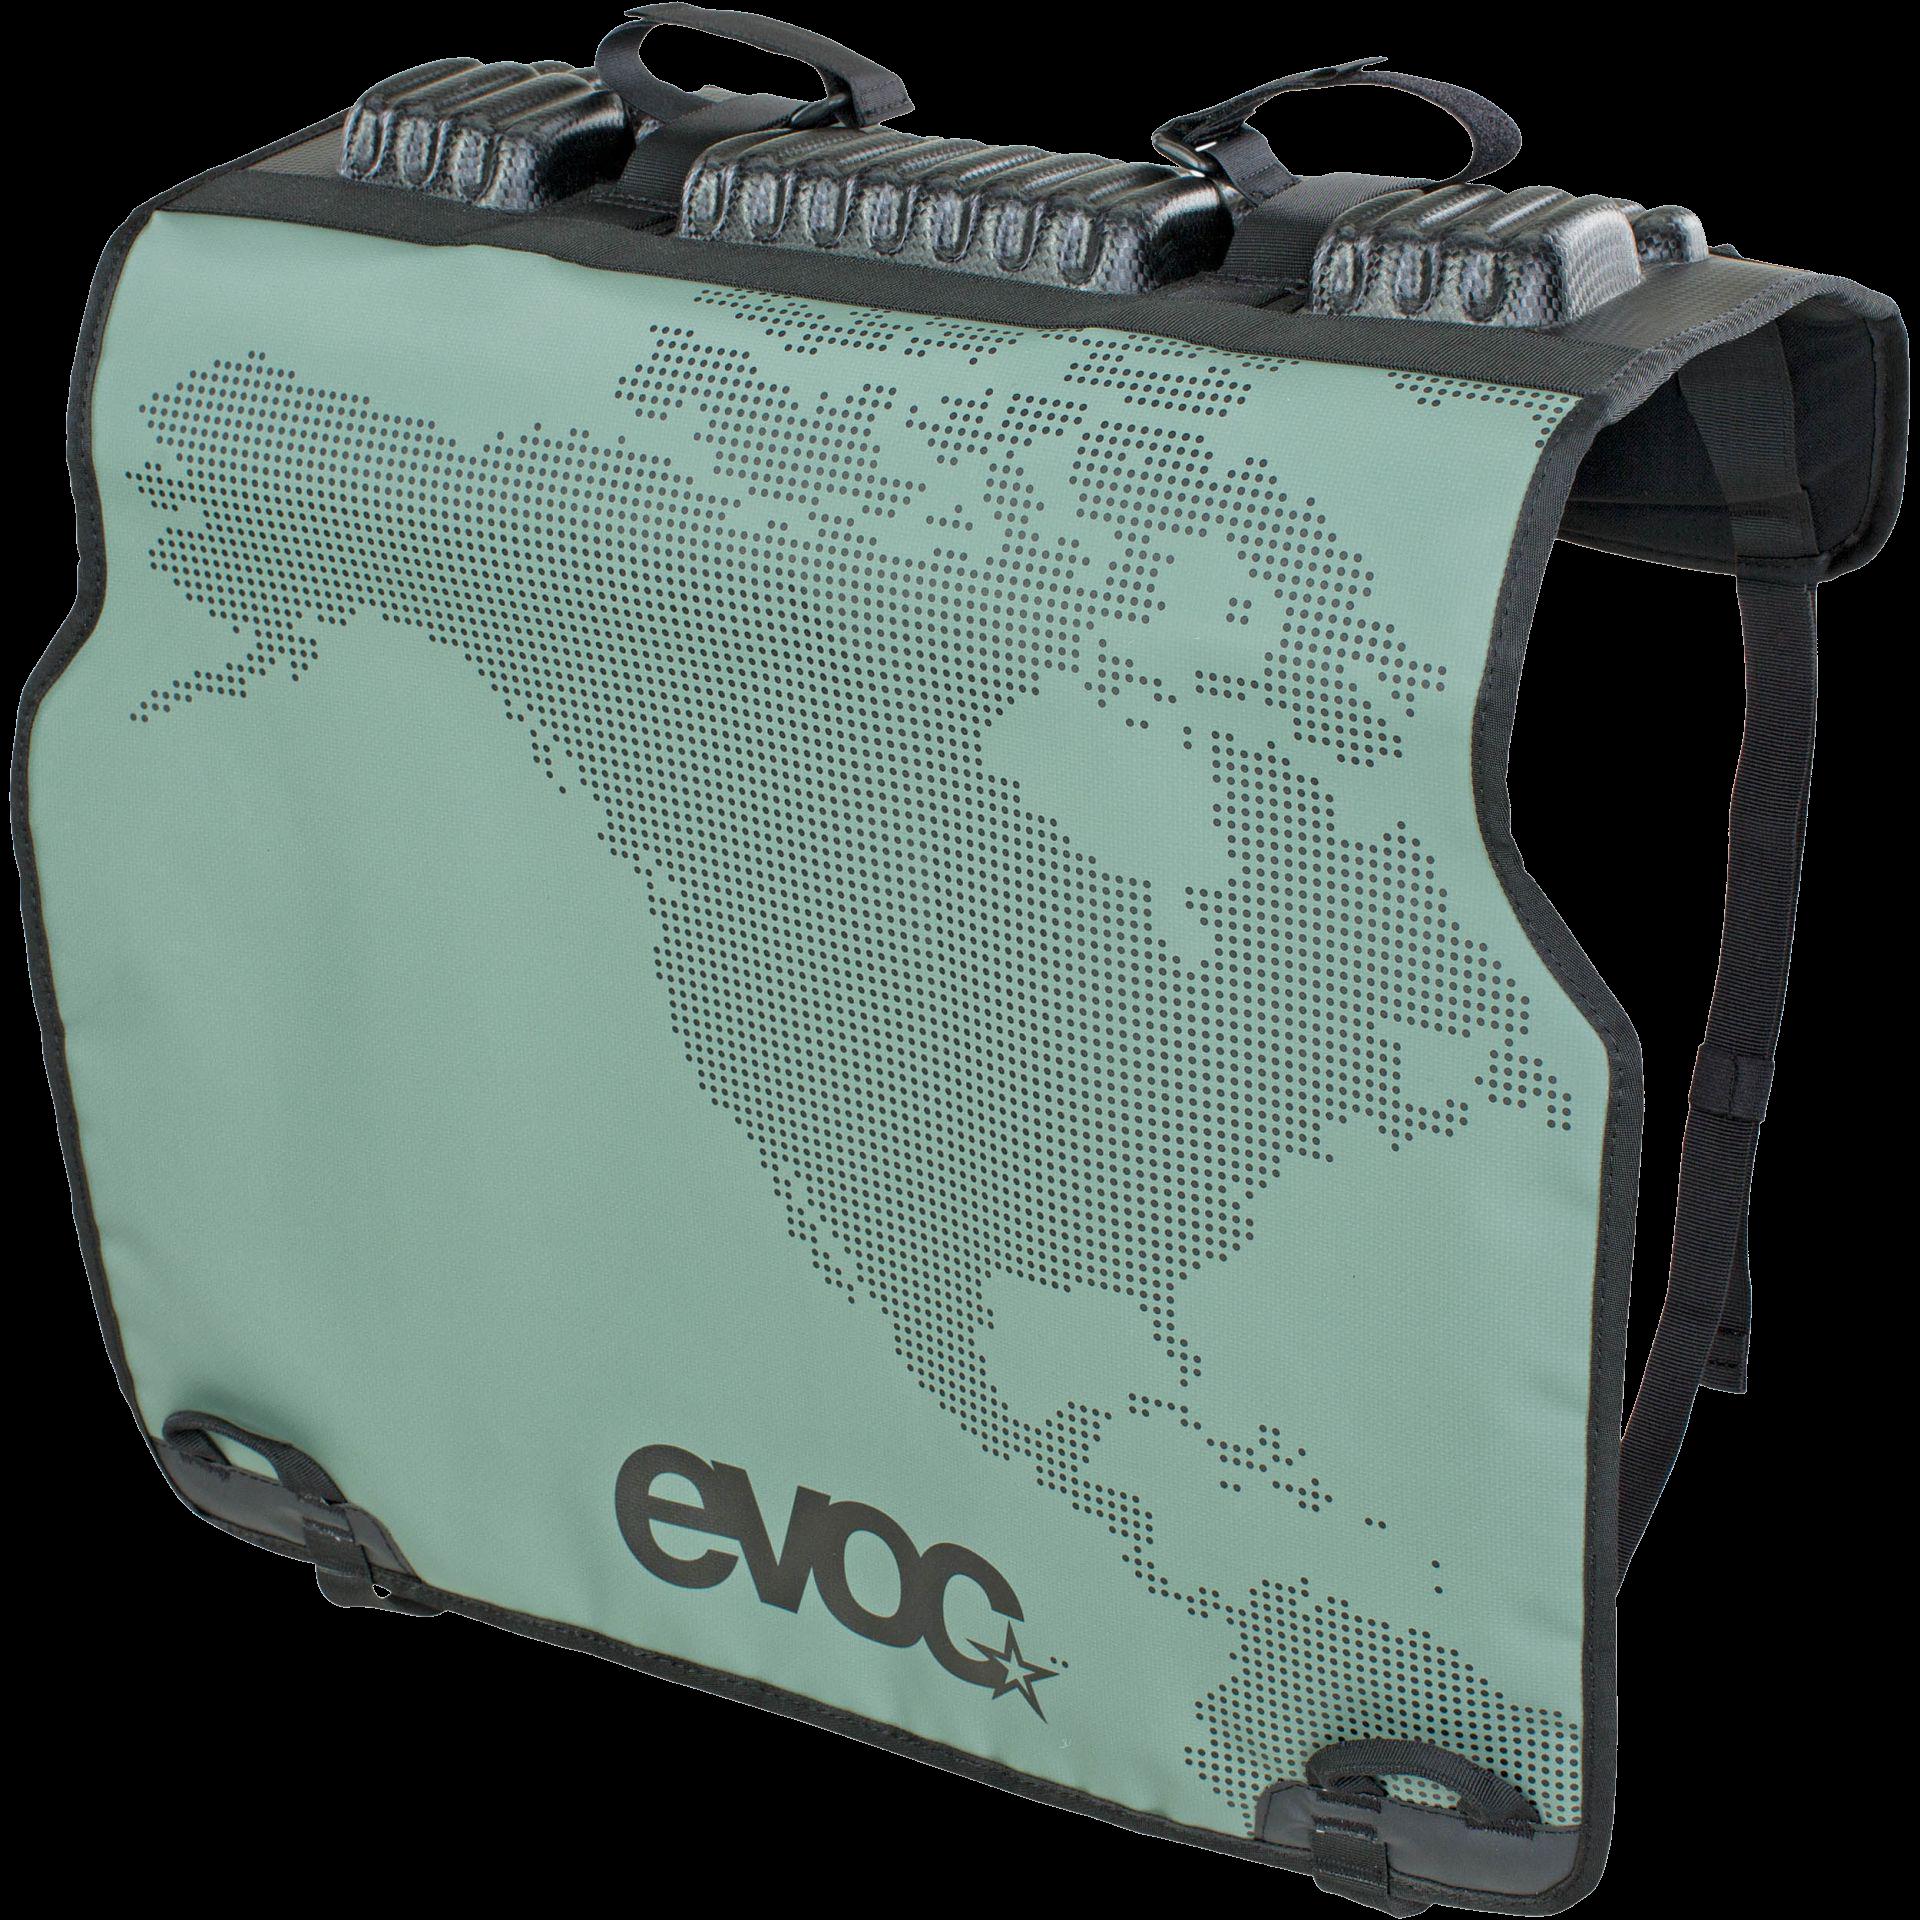 EVOC, Tailgate Pad Duo, Fits all trucks, Olive-1